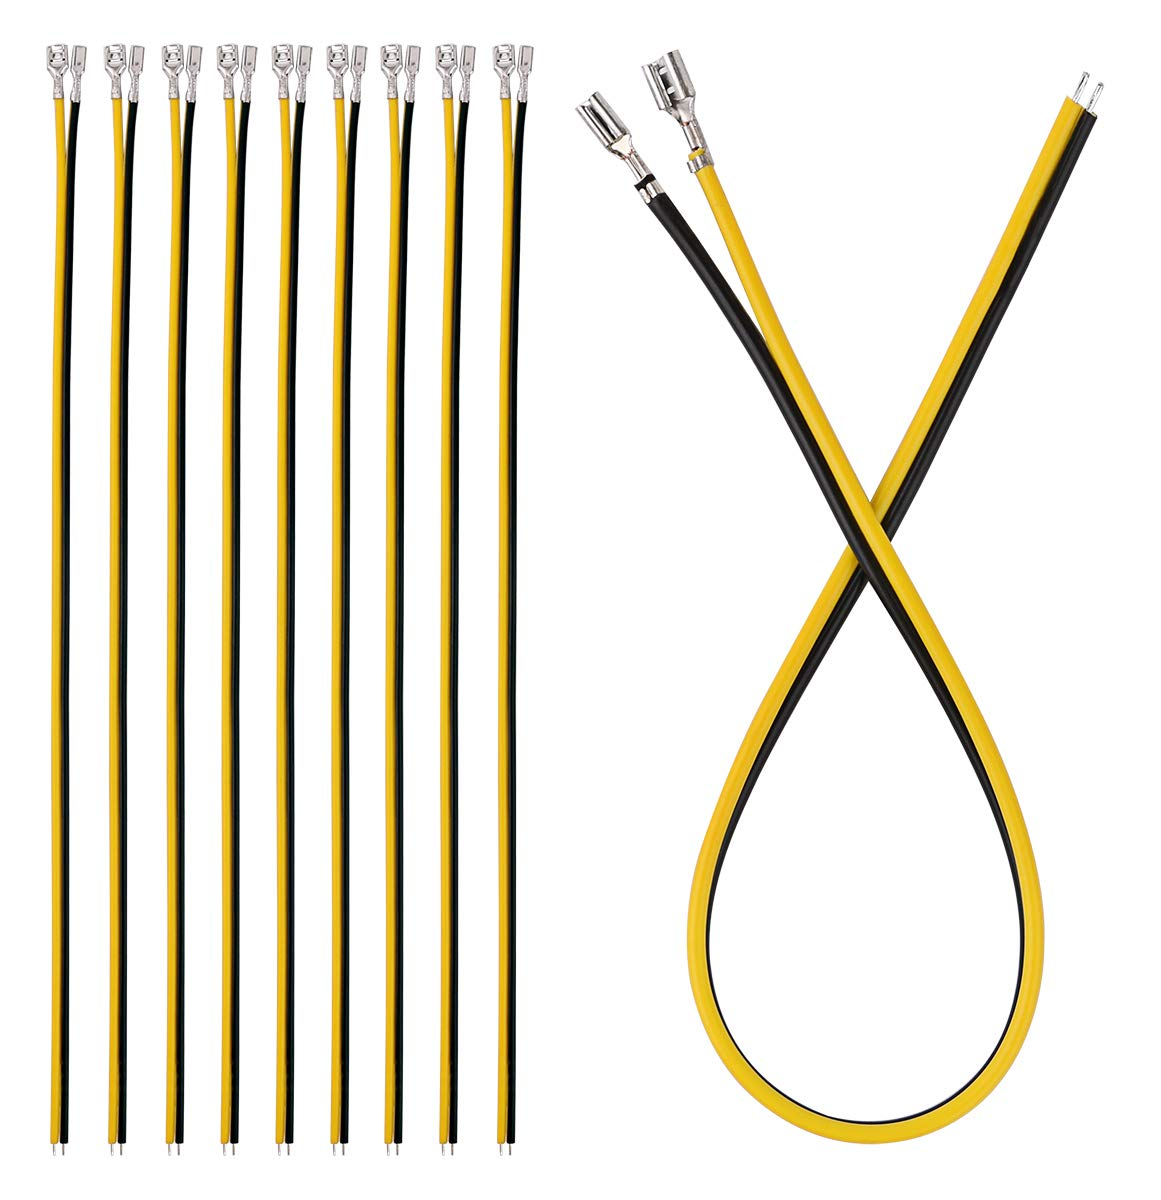 Quick Splice Crimp Terminals Kit AWG 22~14 Gauge for Car Audio Speaker 180pcs Brass Crimp Terminal Female Spade Connector with 180pcs Insulating Sleeve (2.8//4.8//6.3mm)